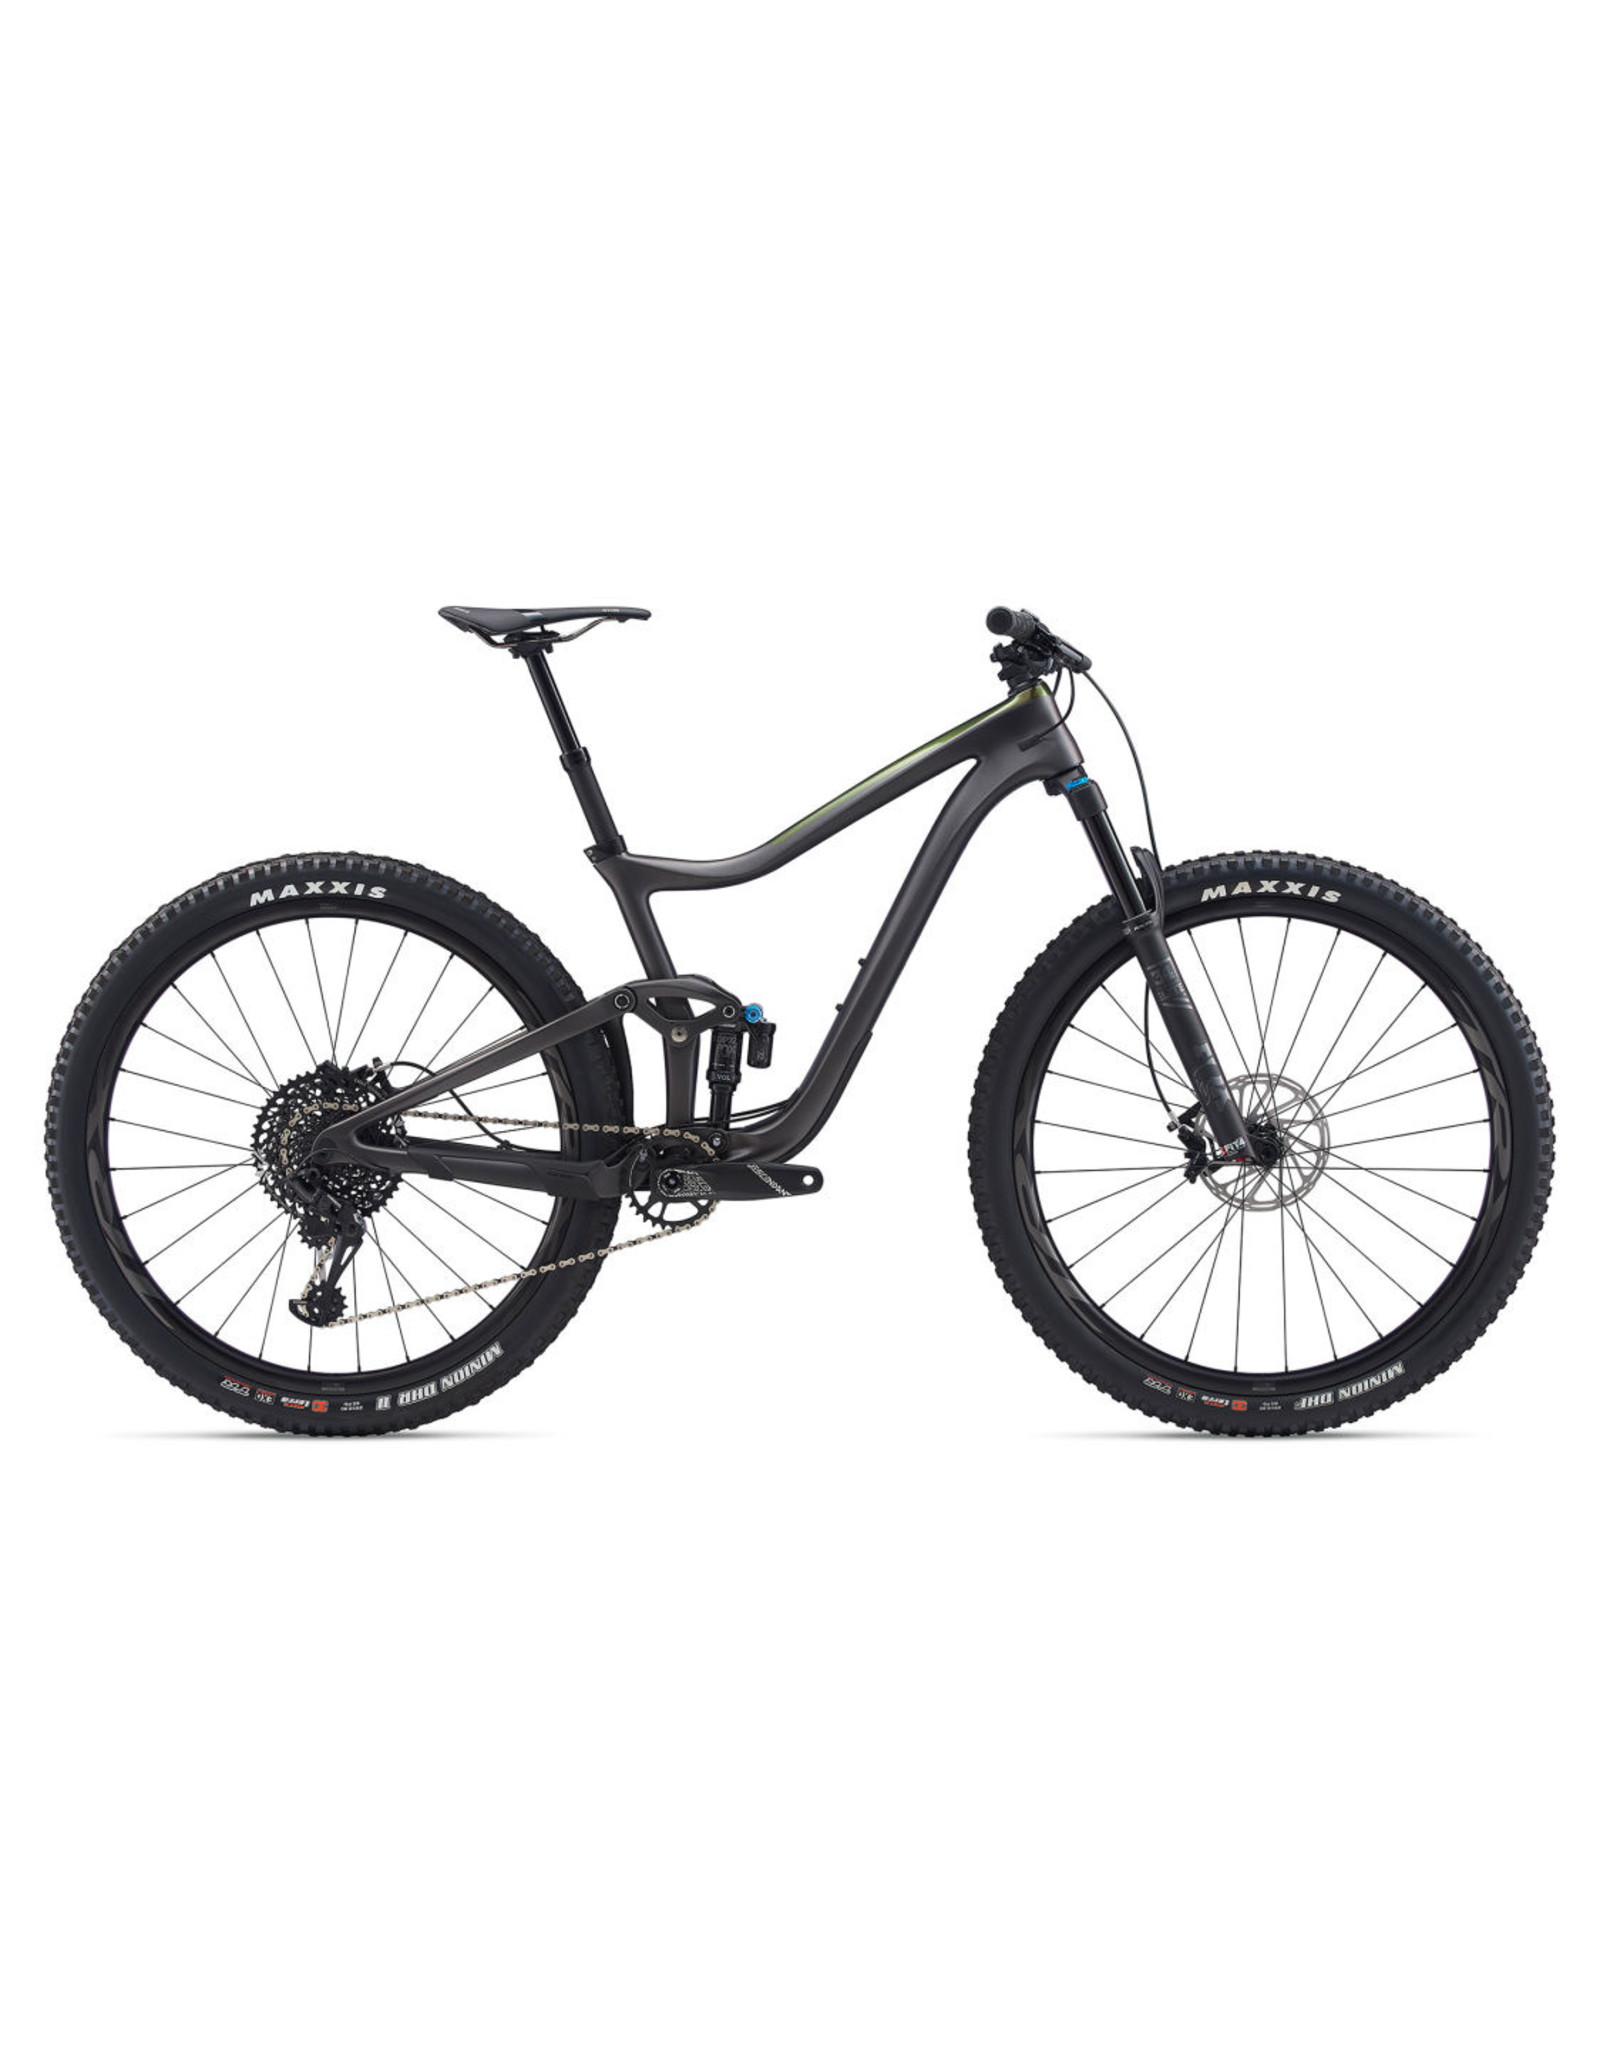 GIANT BICYCLES 2020 Trance Adv Pro 29 1 Met Black